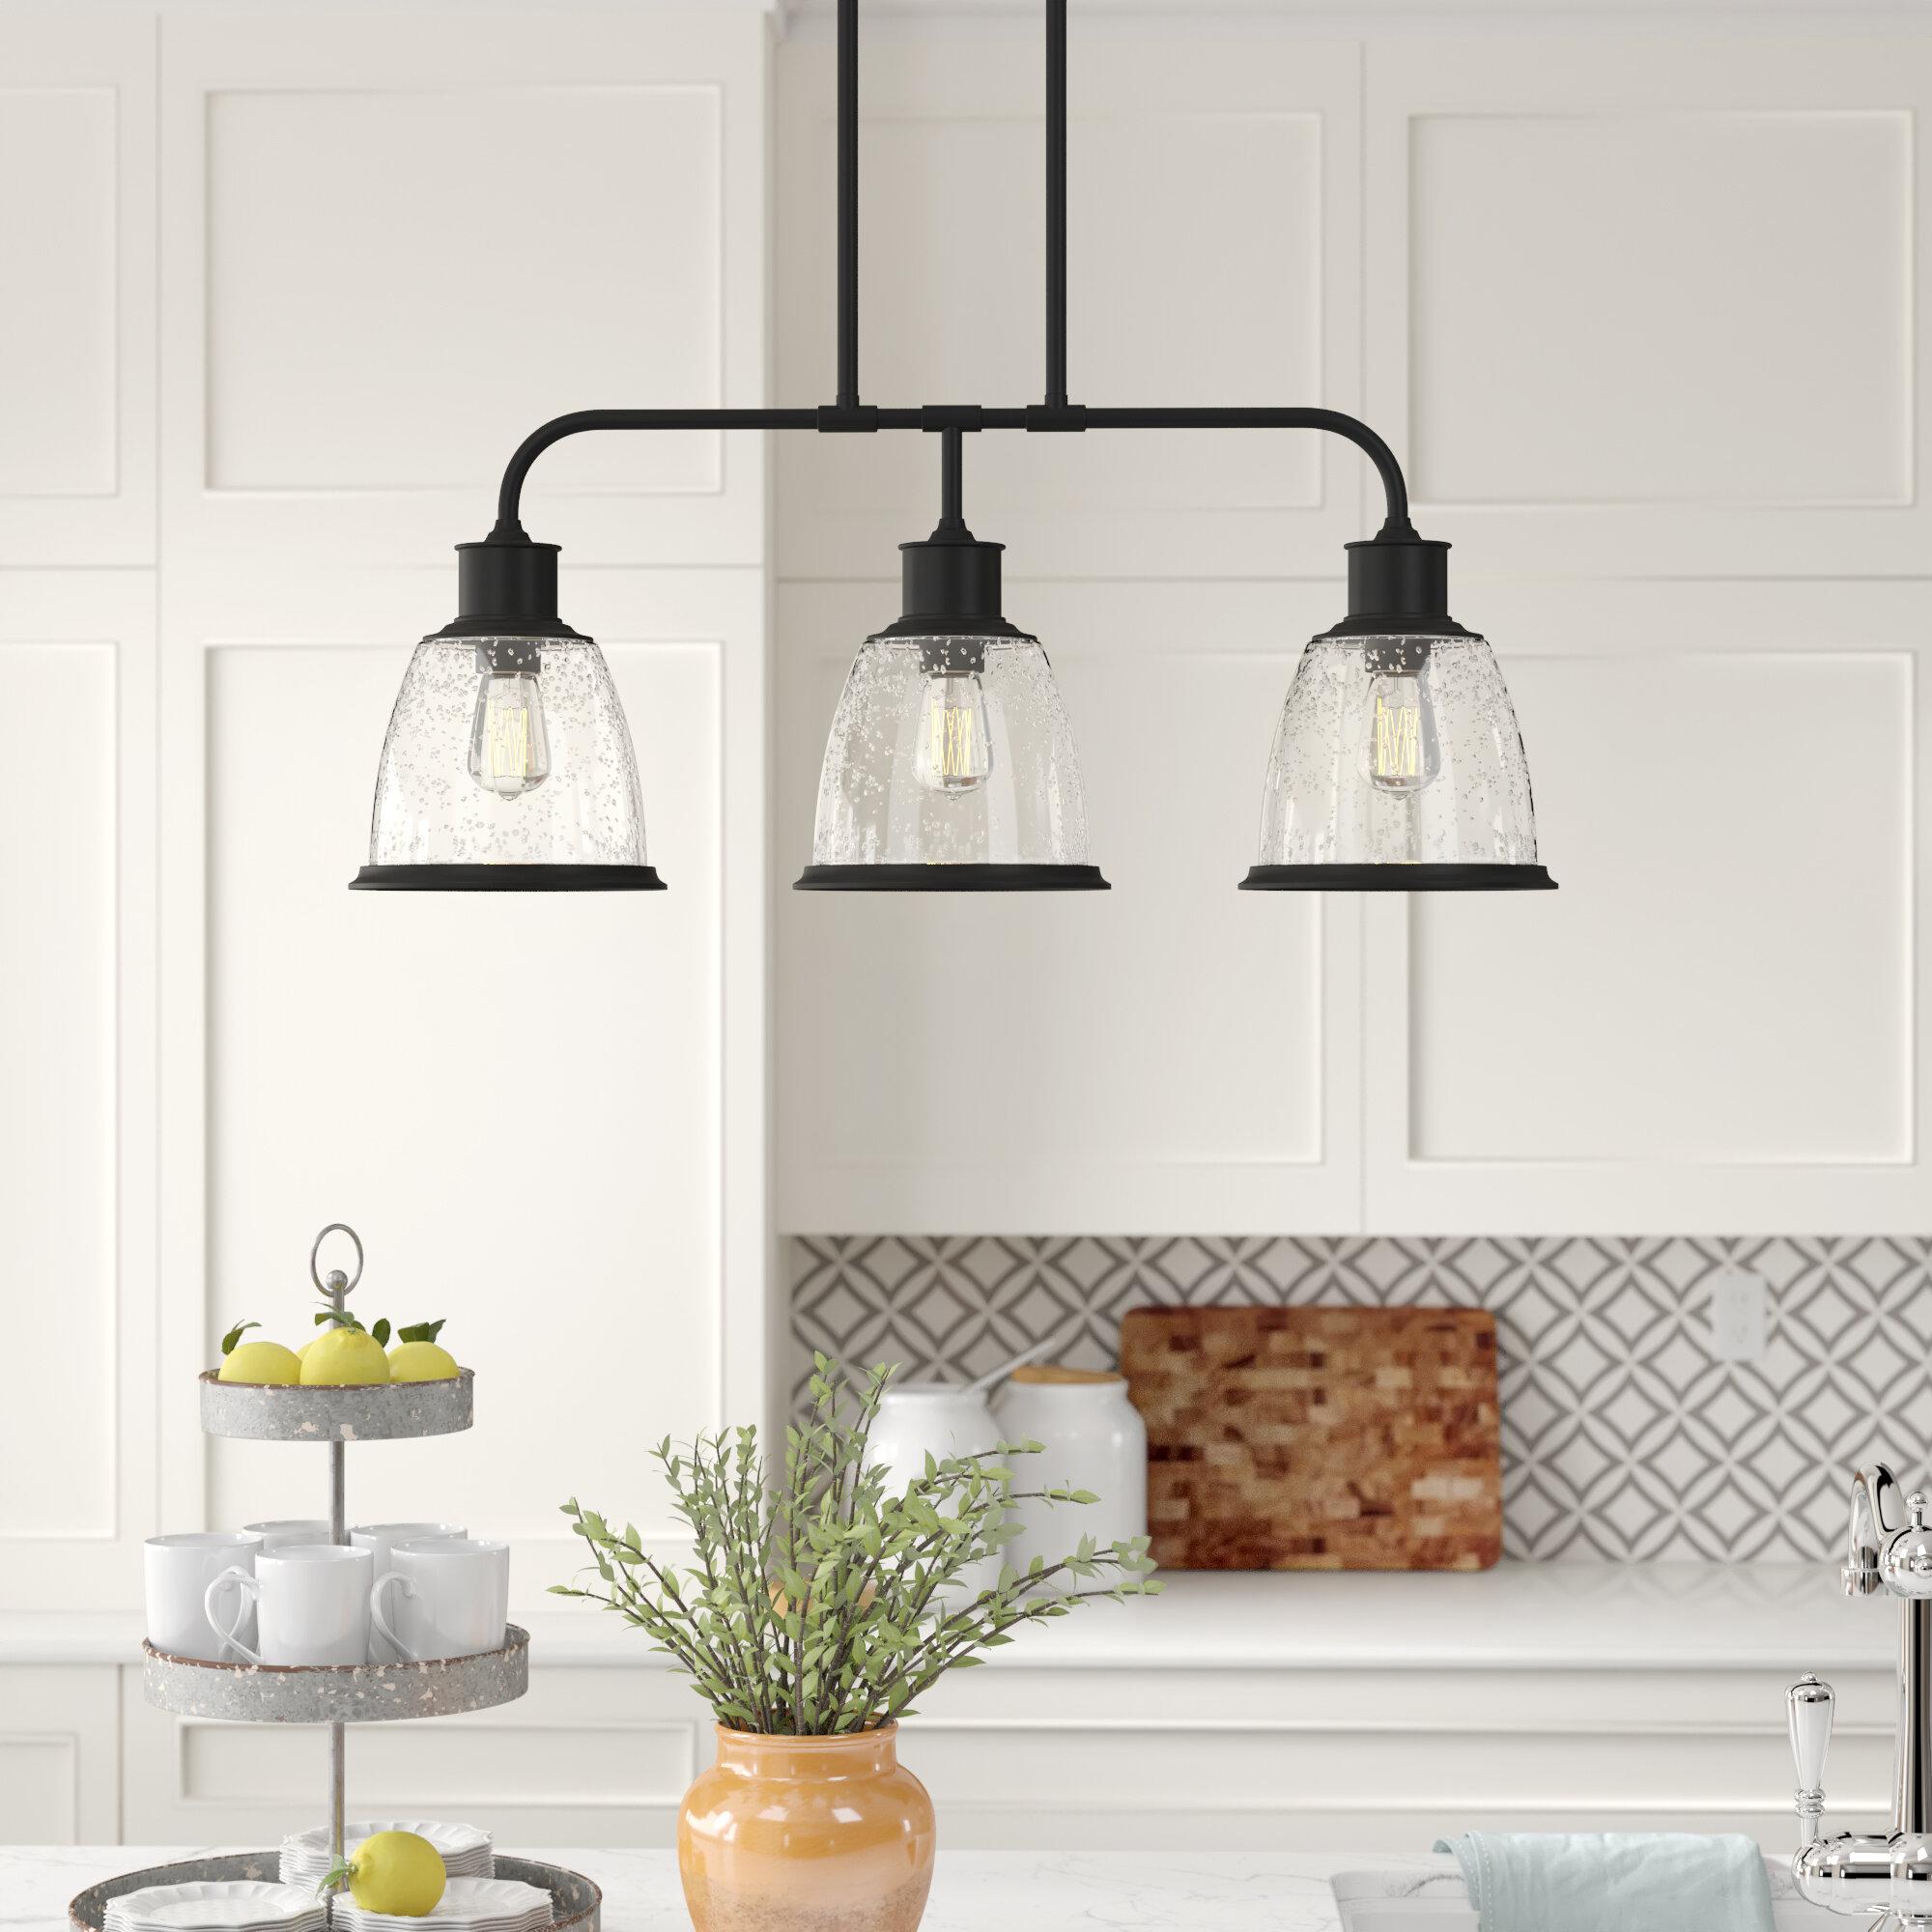 Ambler 3 Light Kitchen Island Bell Pendant Reviews Birch Lane